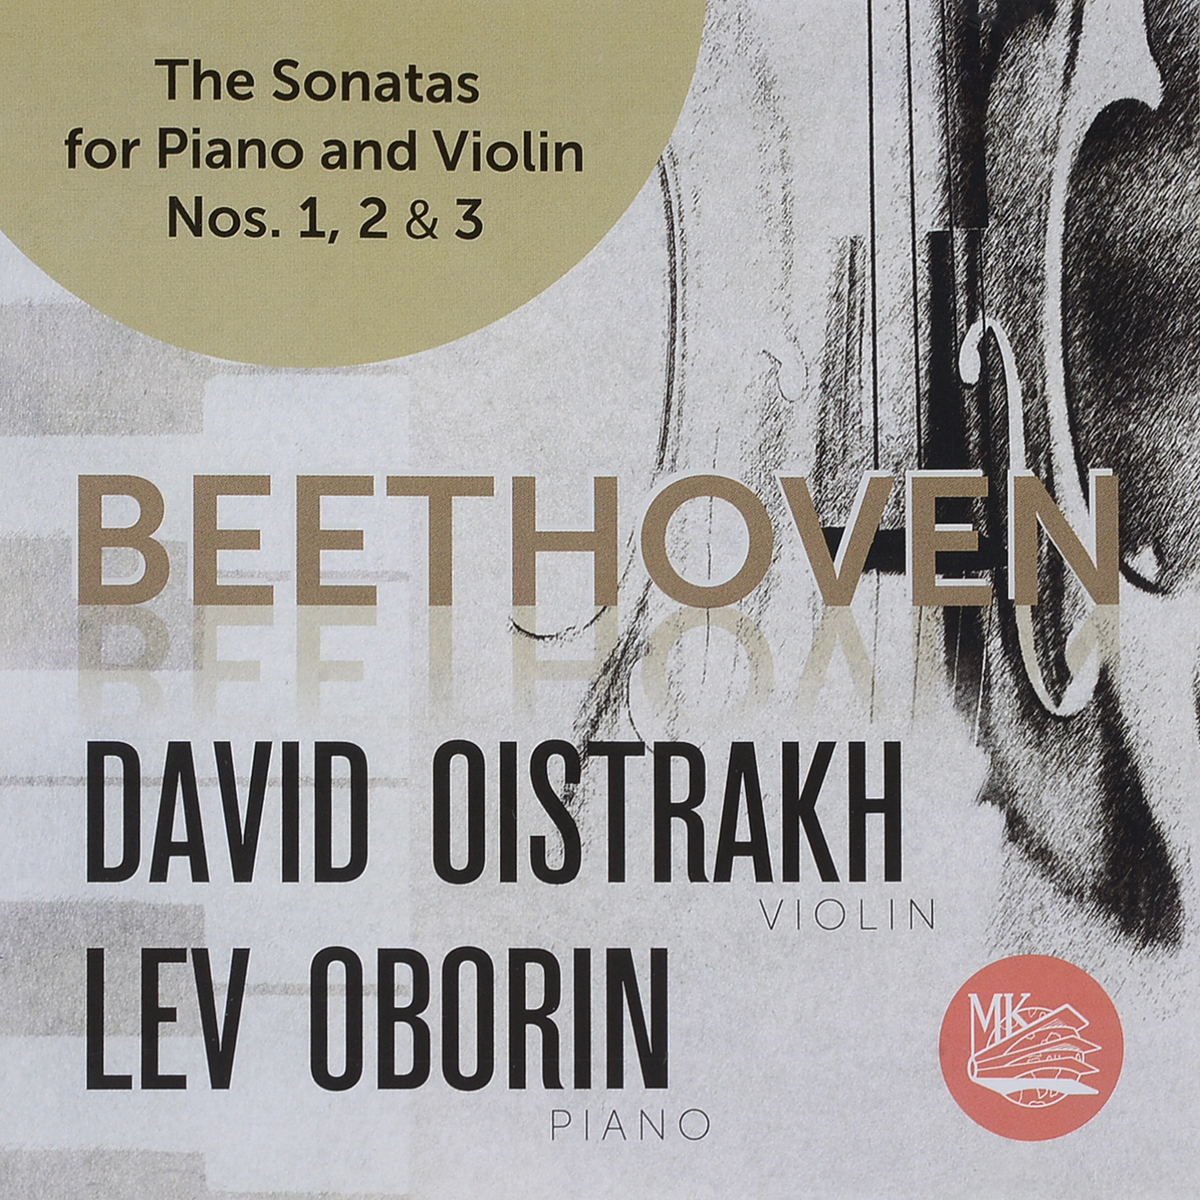 Давид Ойстрах,Лев Оборин David Oistrakh. Lev Oborin. Beethoven. The Sonatas For Piano And Violin No. 1, 2 & 3